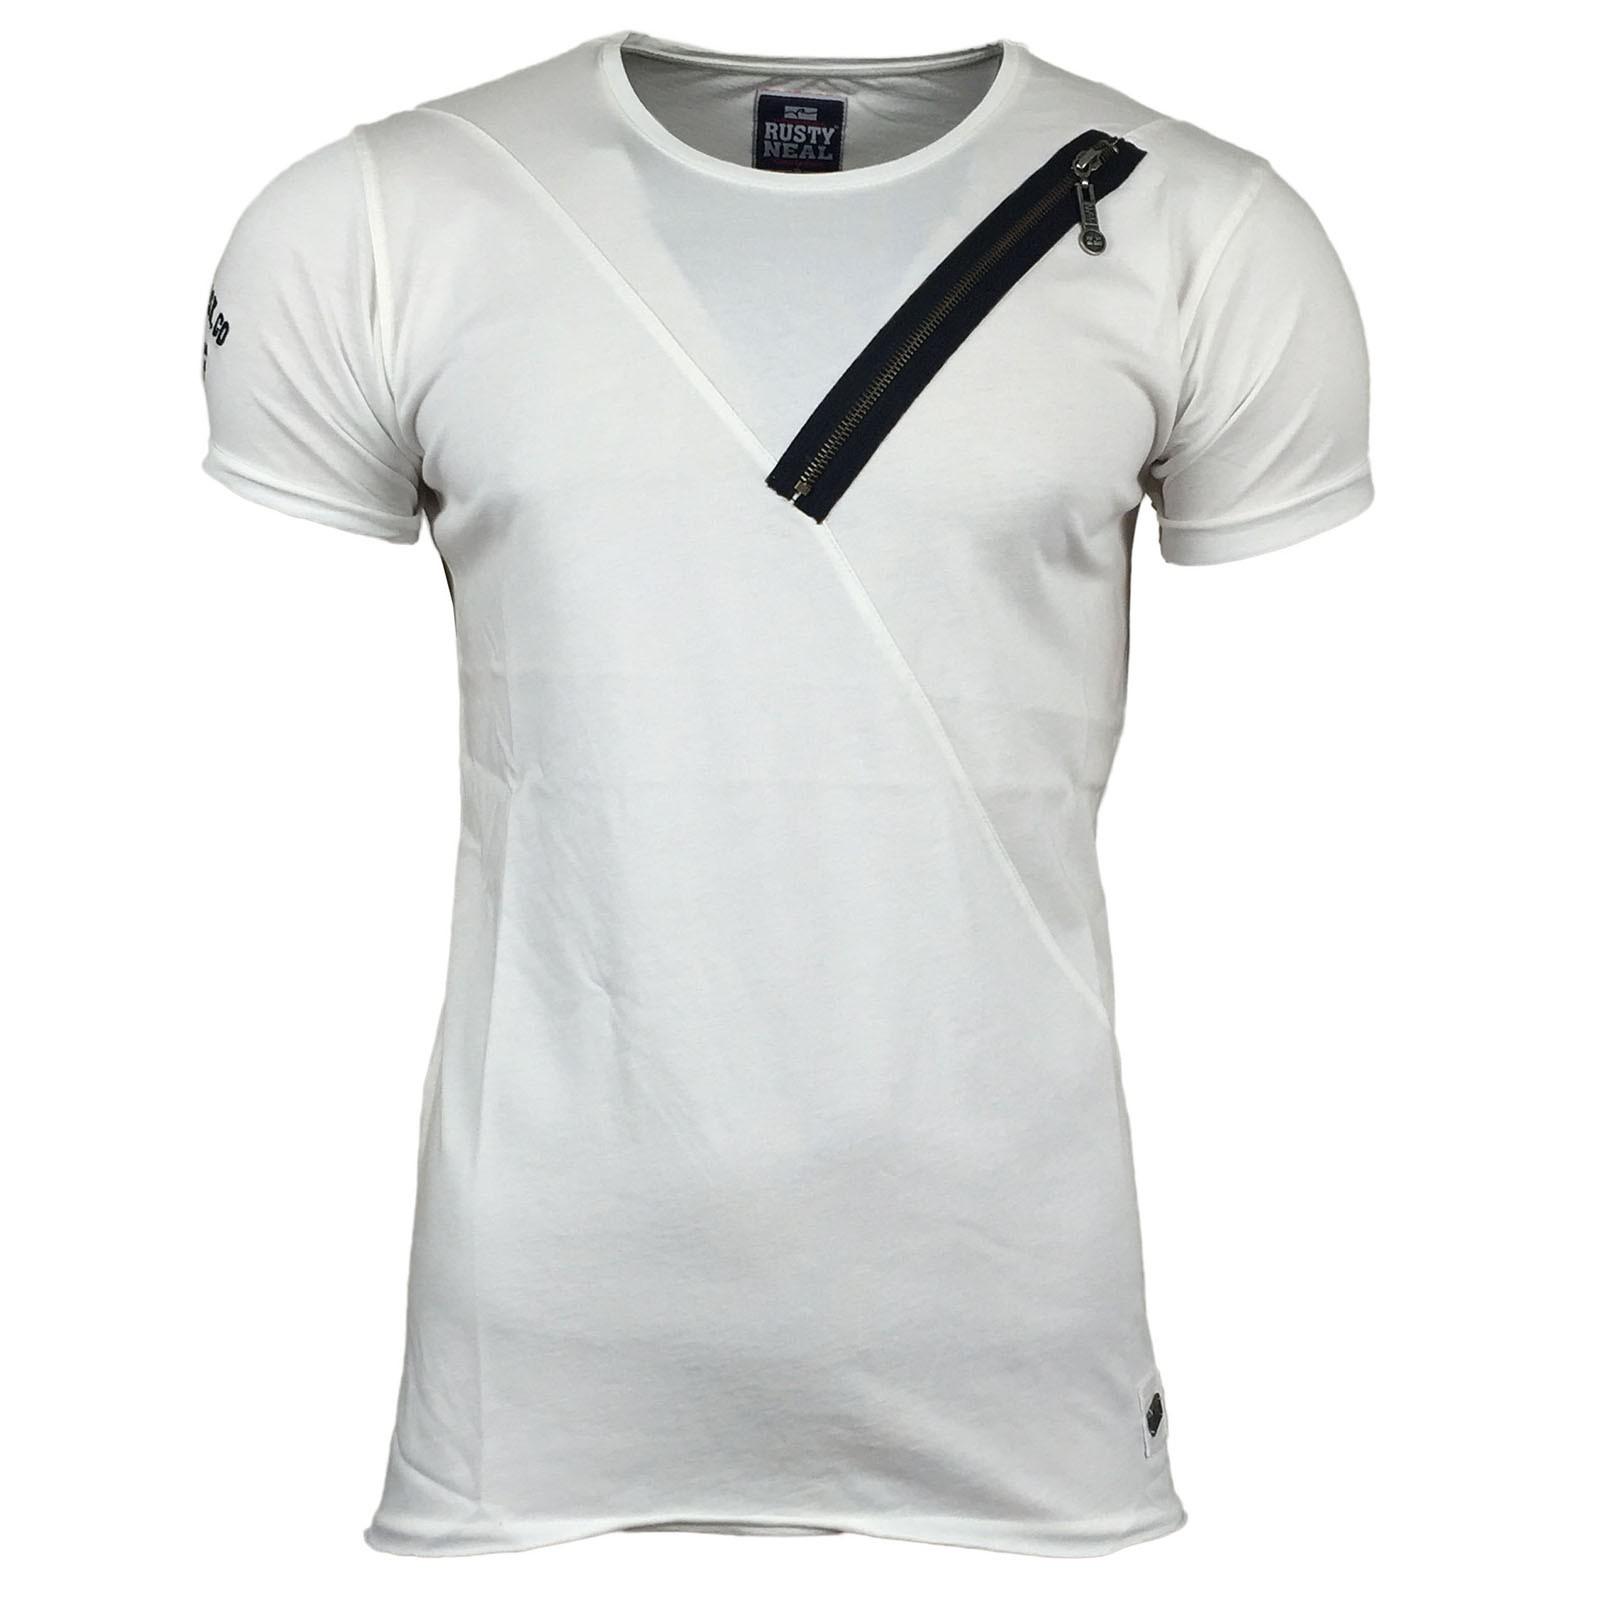 shirt herren mit rei verschluss a16820 herren t shirts kurzarm. Black Bedroom Furniture Sets. Home Design Ideas